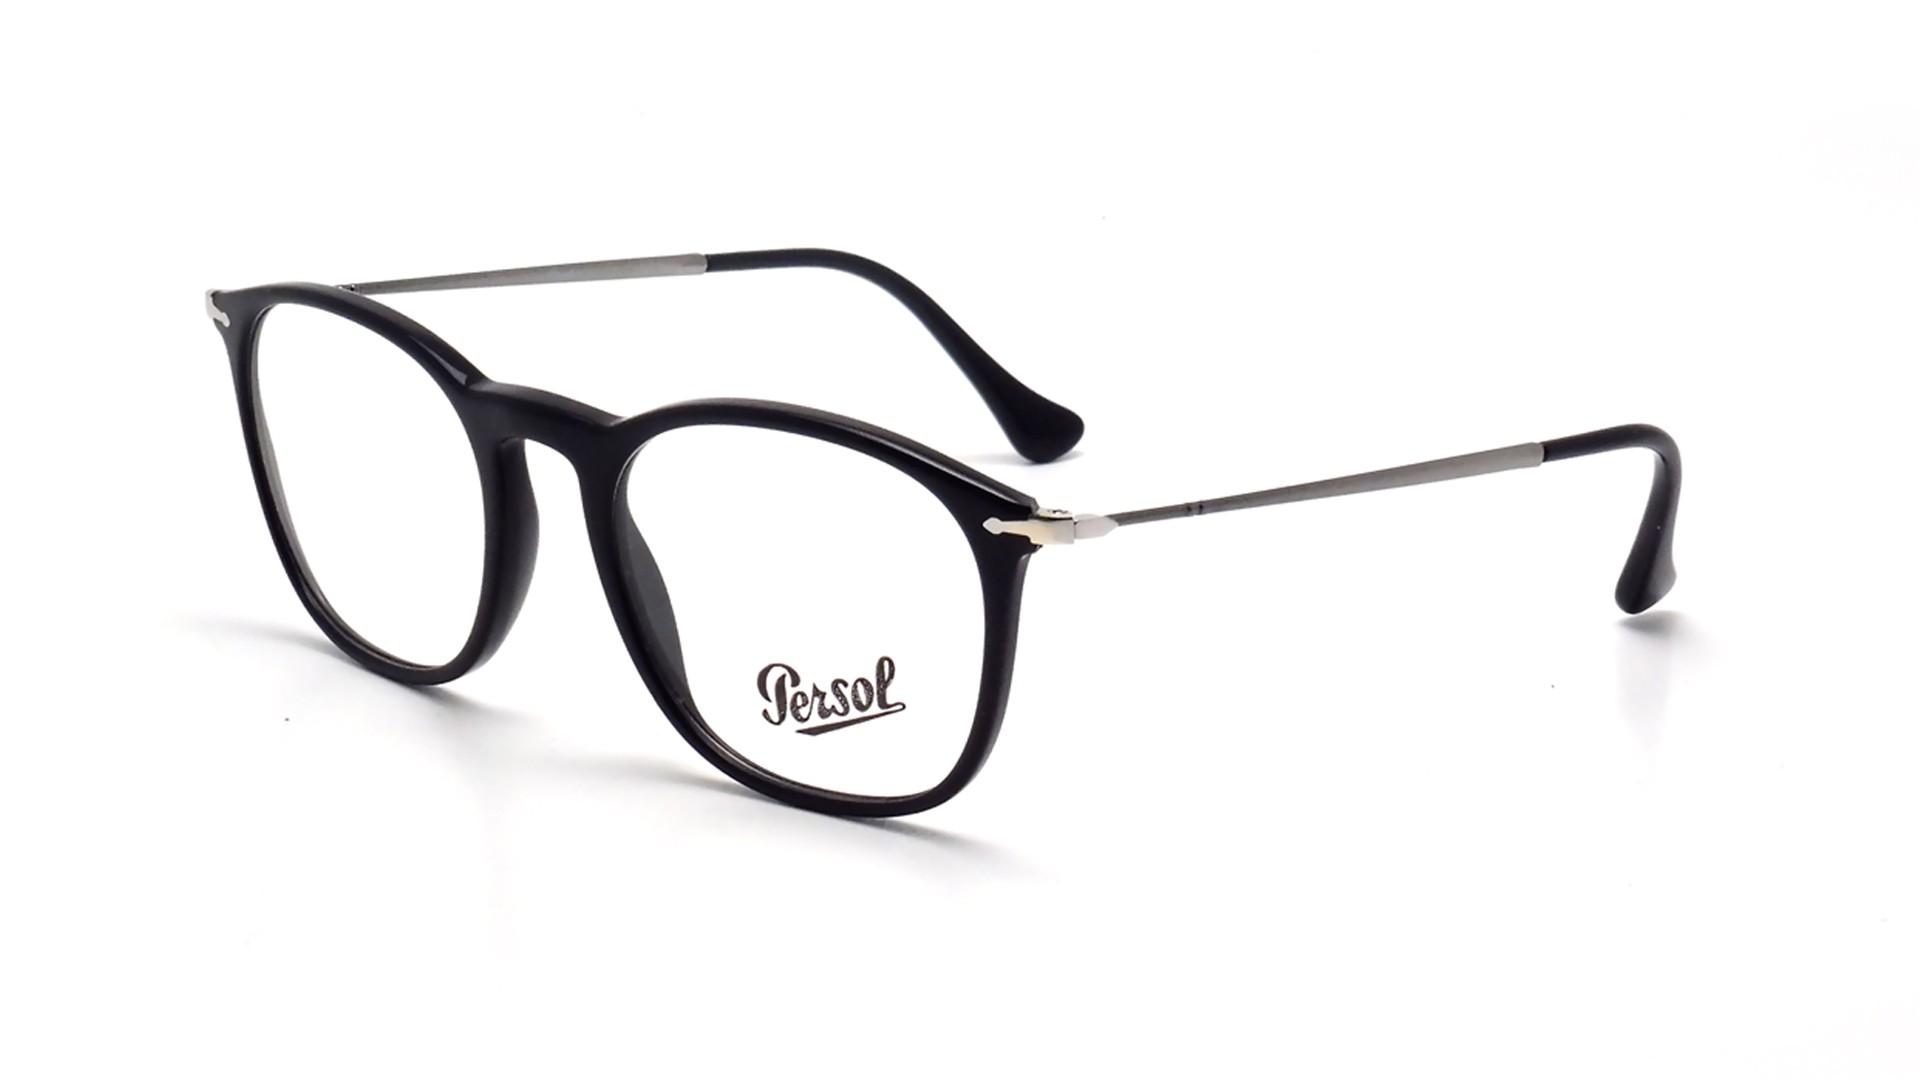 Eyeglasses Persol Reflex Edition Black PO3124V 95 50-19 Medium 43e887bbb213